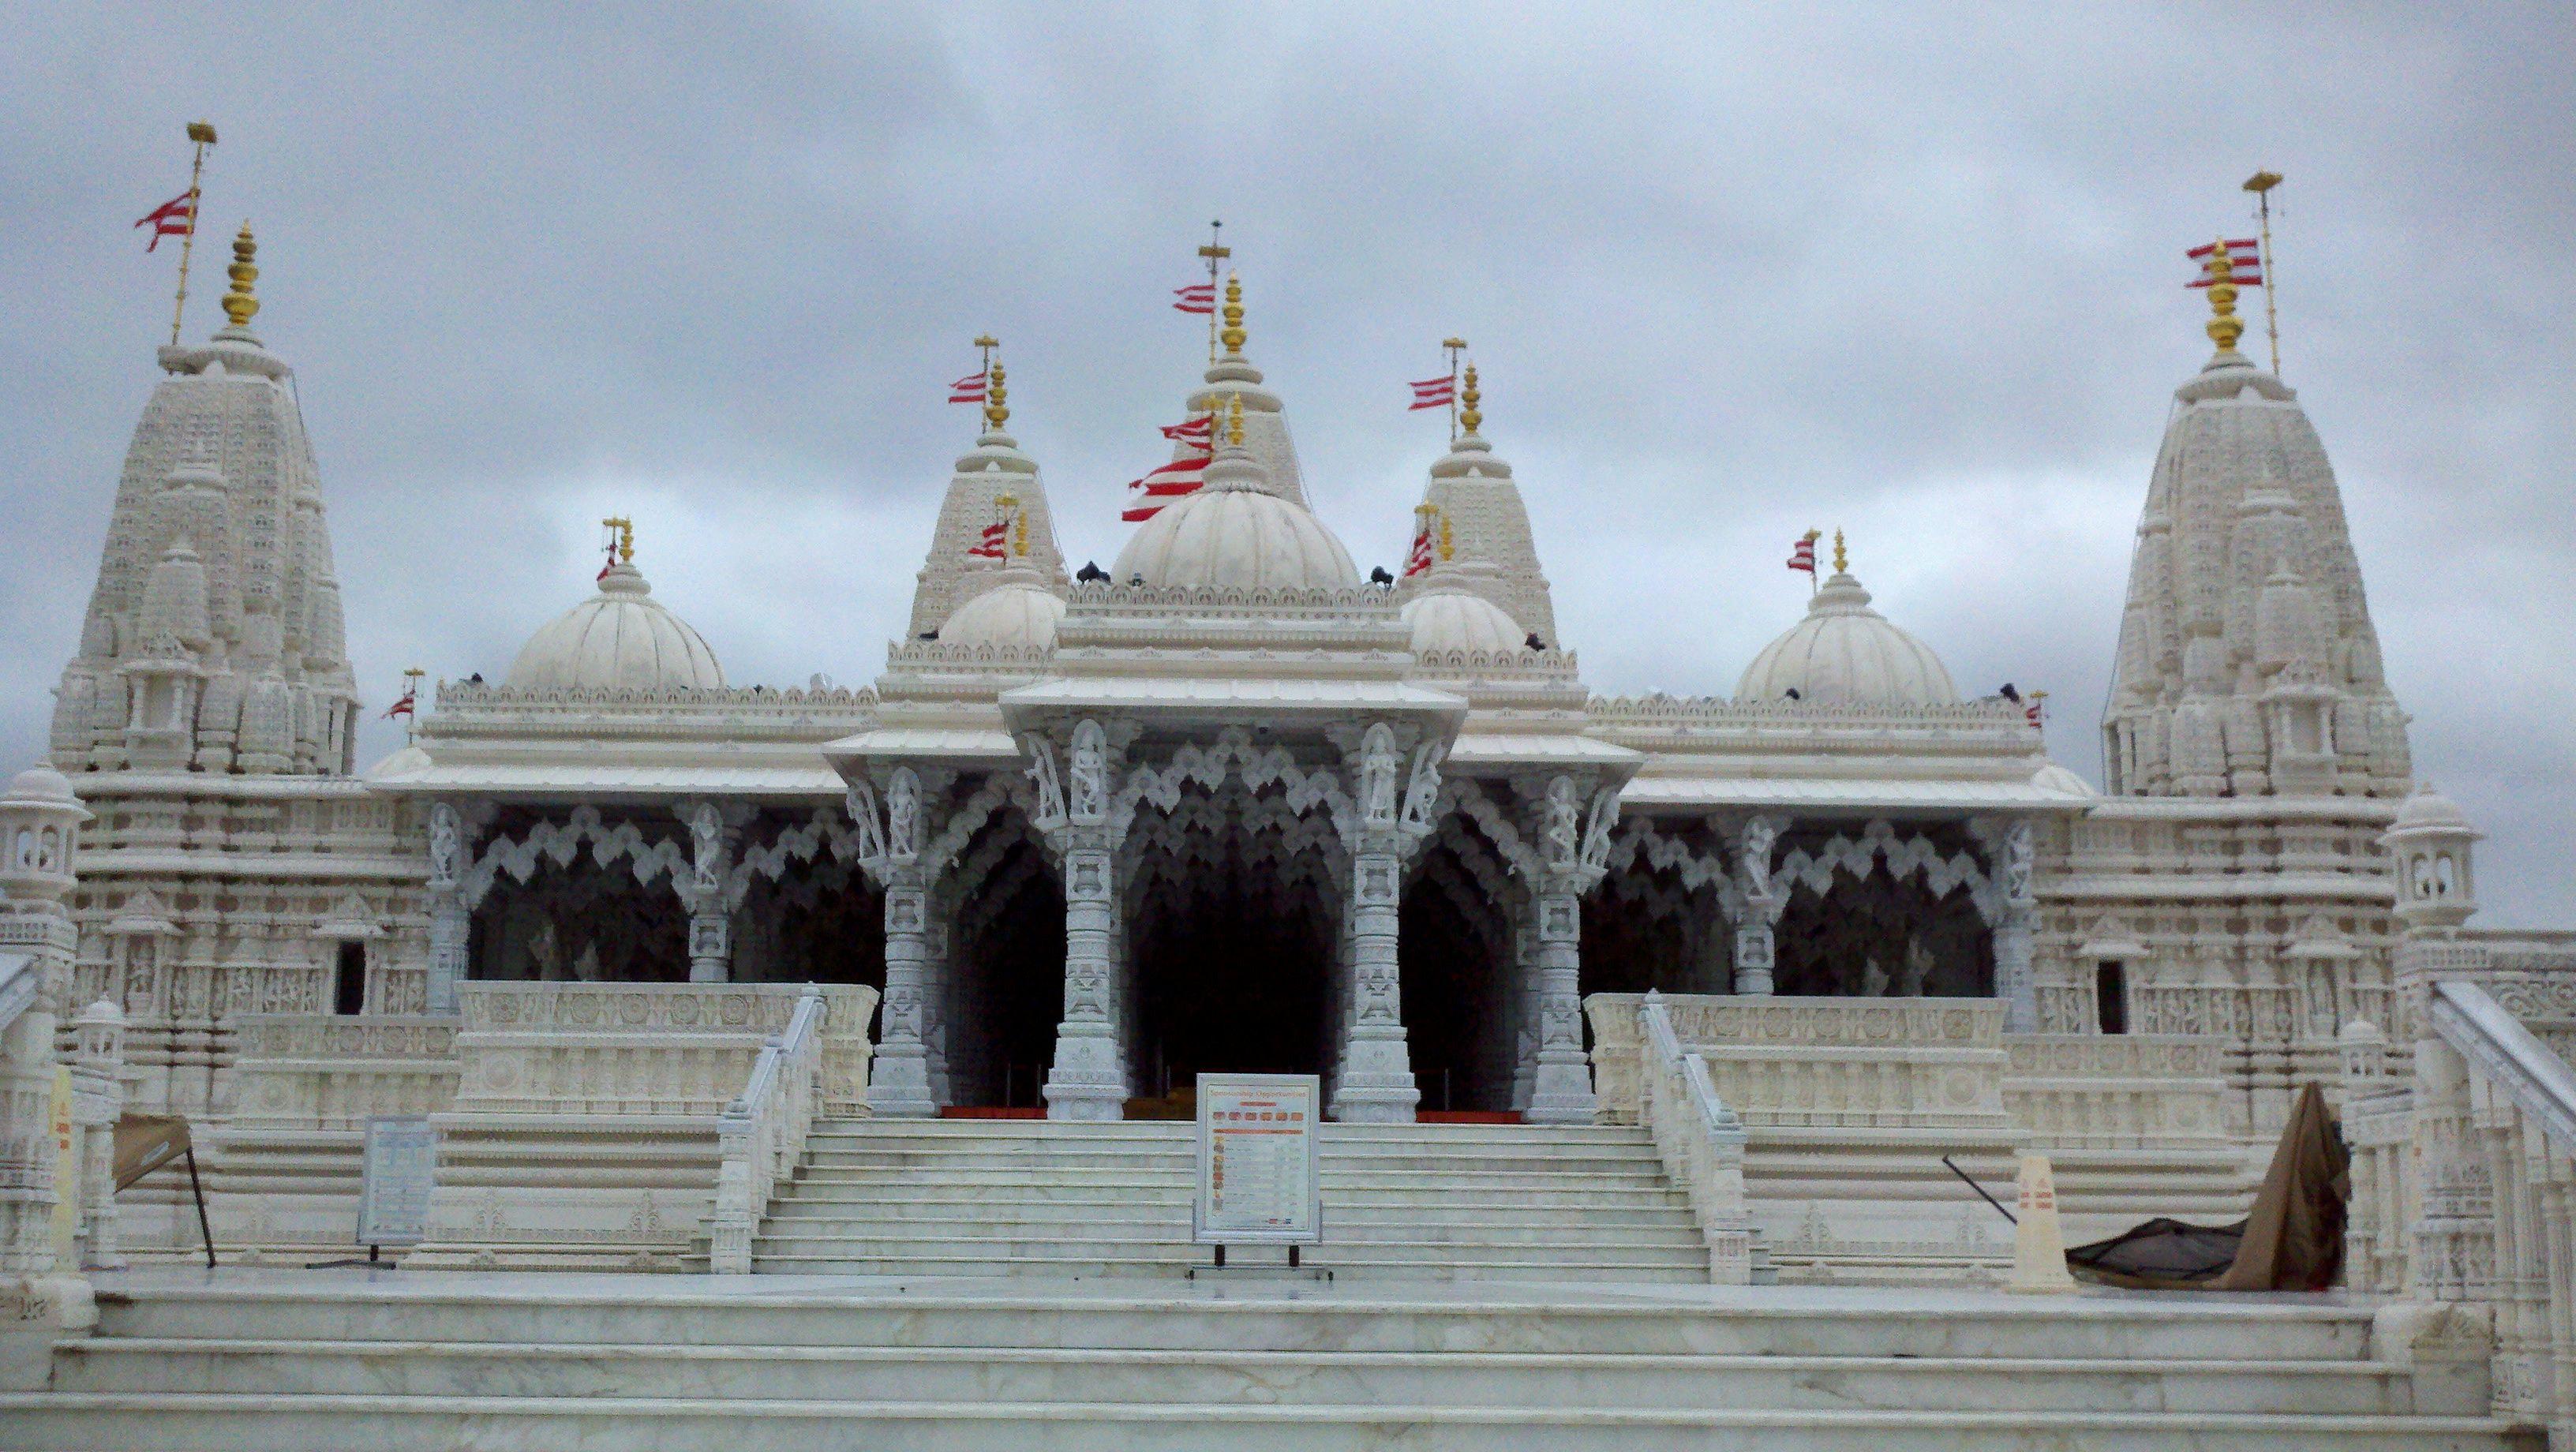 baps swaminarayan mandir hindu temple 1150 brand lane stafford tx 77477